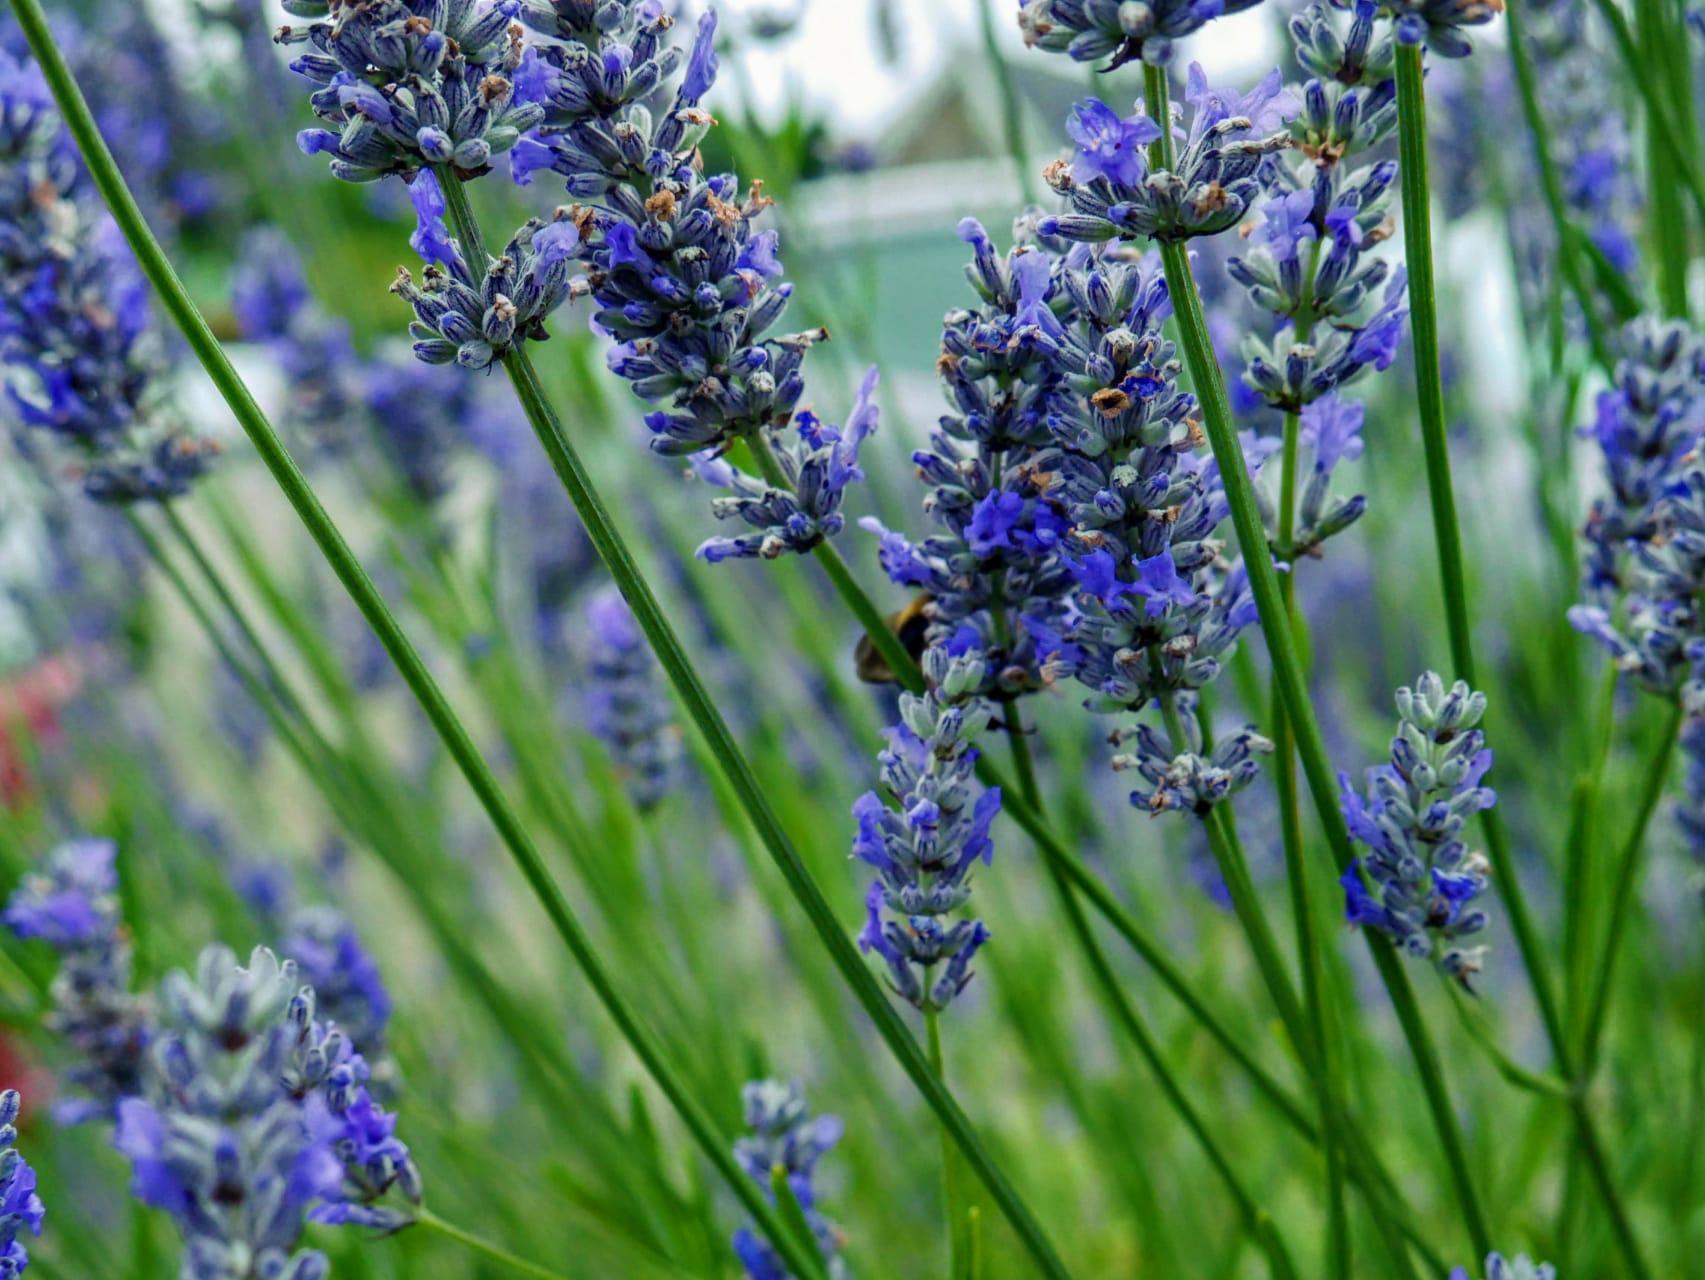 Wexford - Wexford Lavender Farm: Irelands only commercial Lavender Farm